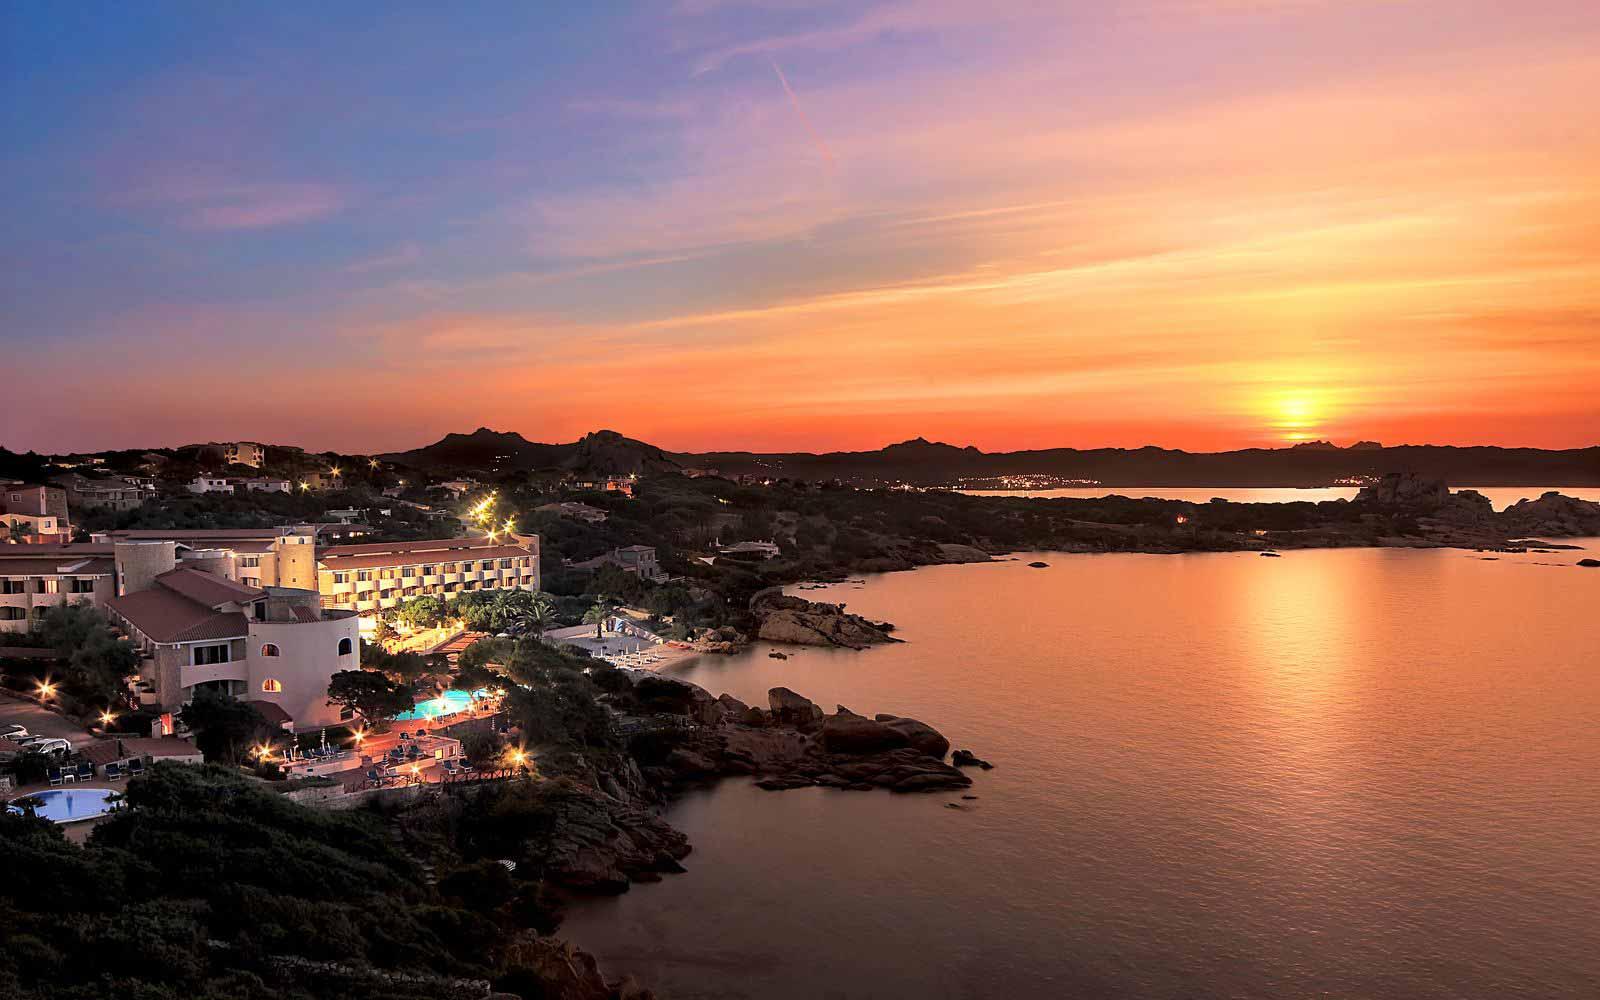 Sunset over Grand Hotel Smeraldo Beach